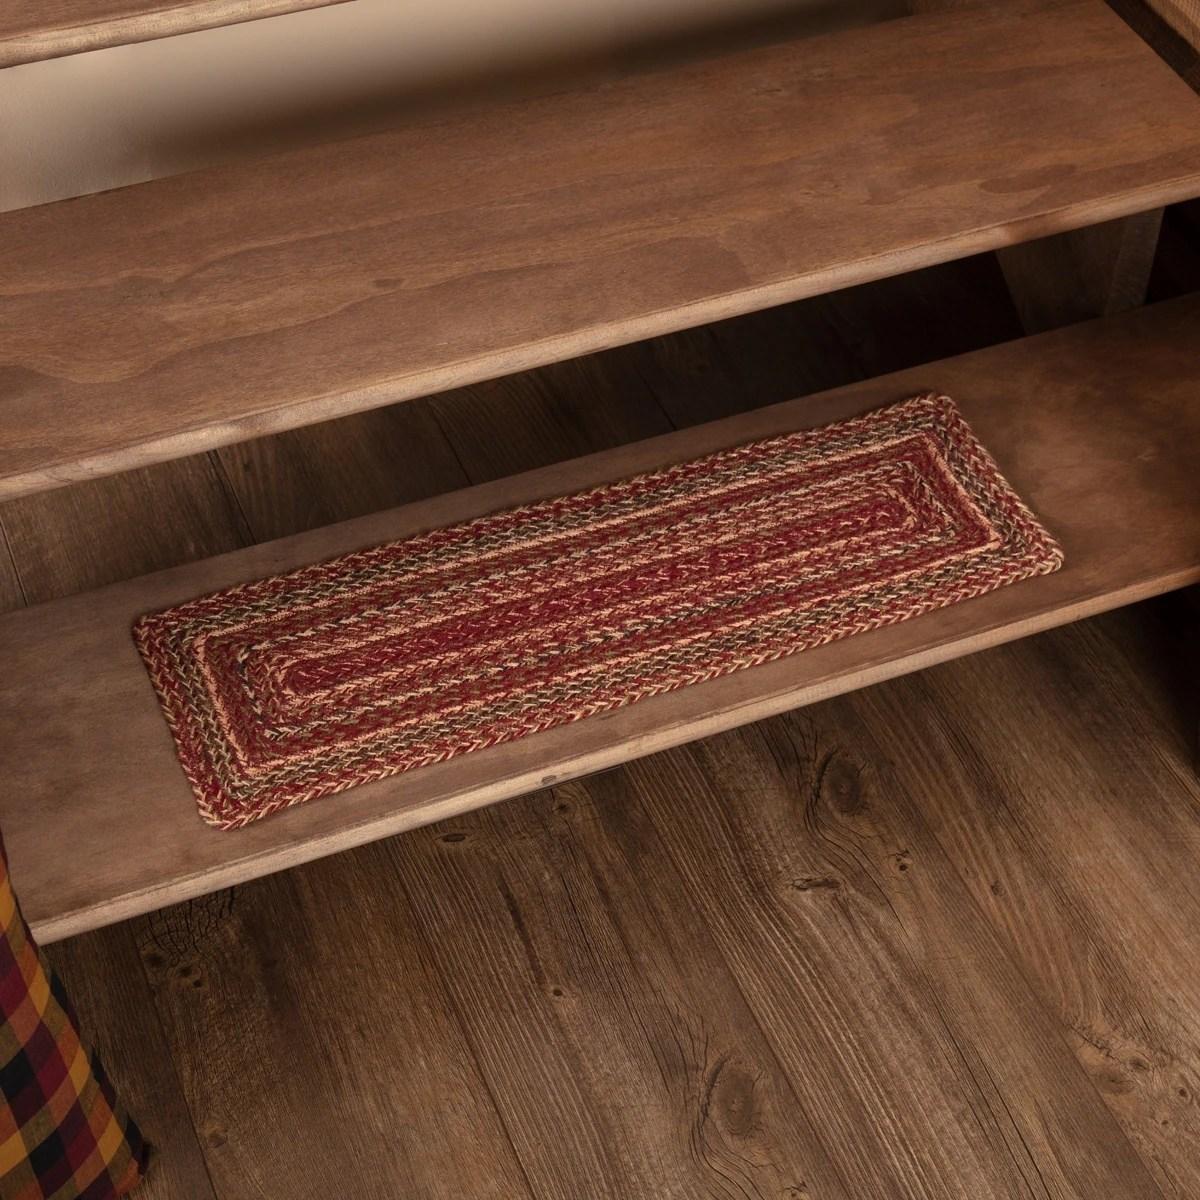 Shop Vhc Cider Mill Burgundy Red Primitive Country Flooring Jute | Wood Floor Stair Treads | Brazilian Cherry | Stair Nosing | Oak Stair Risers | Vinyl Flooring | Carpet